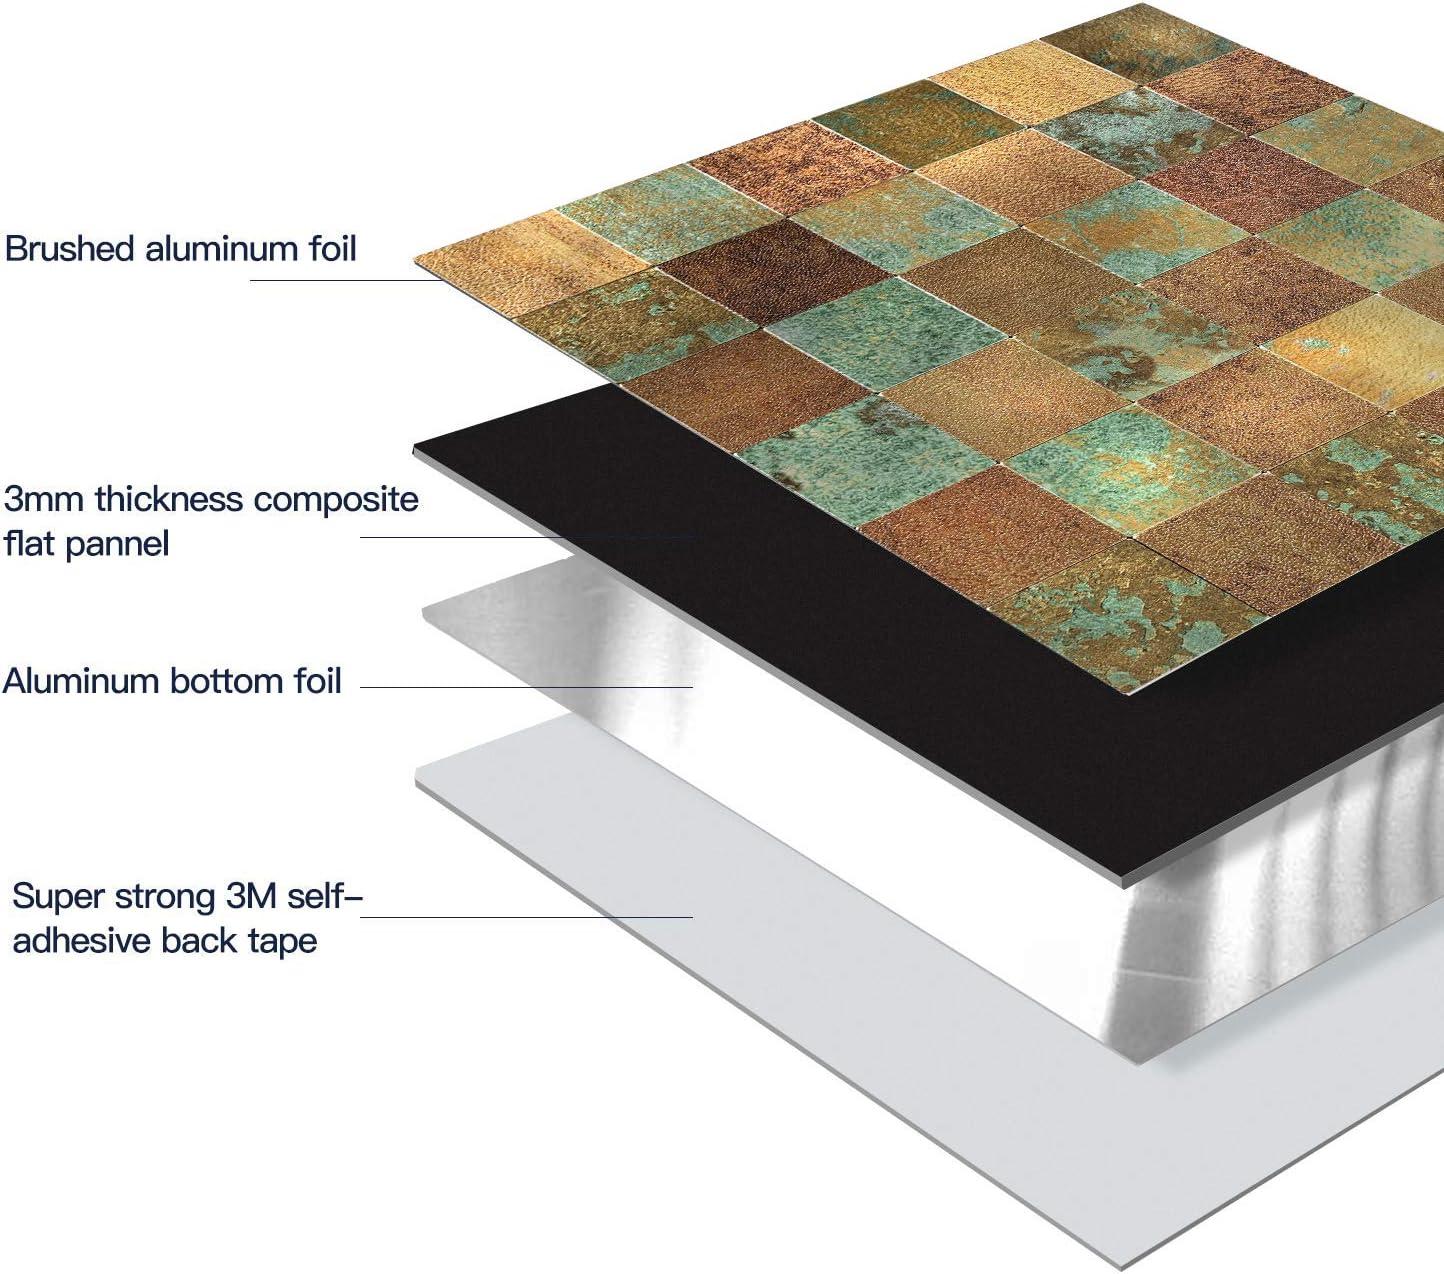 HomeyMosaic Peel and Stick Tile Backsplash for Kitchen Wall Decor Aluminum Surface Metal Mosaic Tiles Sticker,Square Plaid Imitation Rust Classical Retro Bronze,12x12 x 1 Tiles